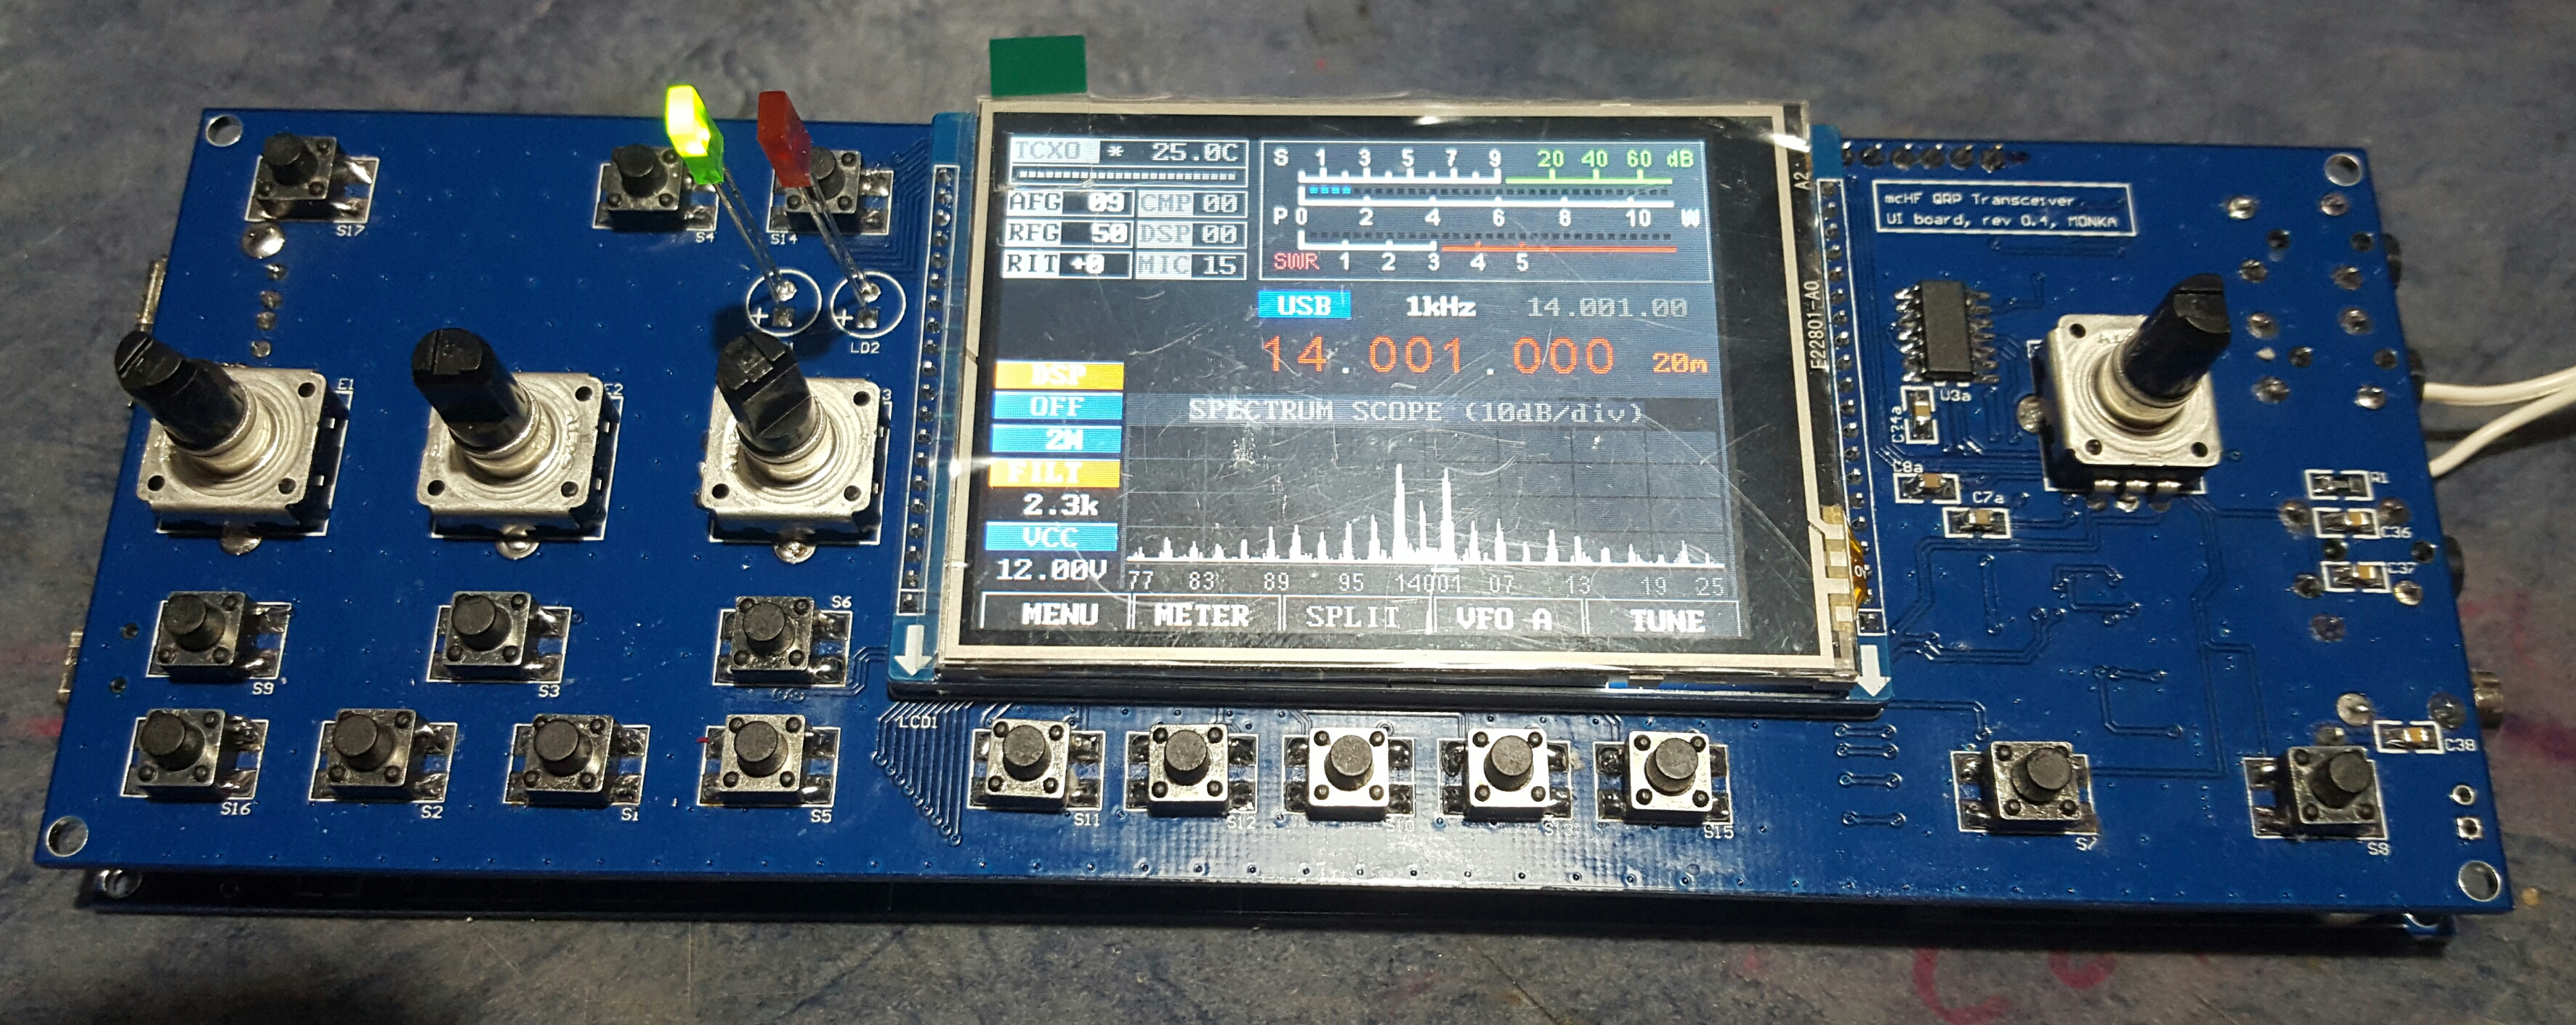 Si570 firmware